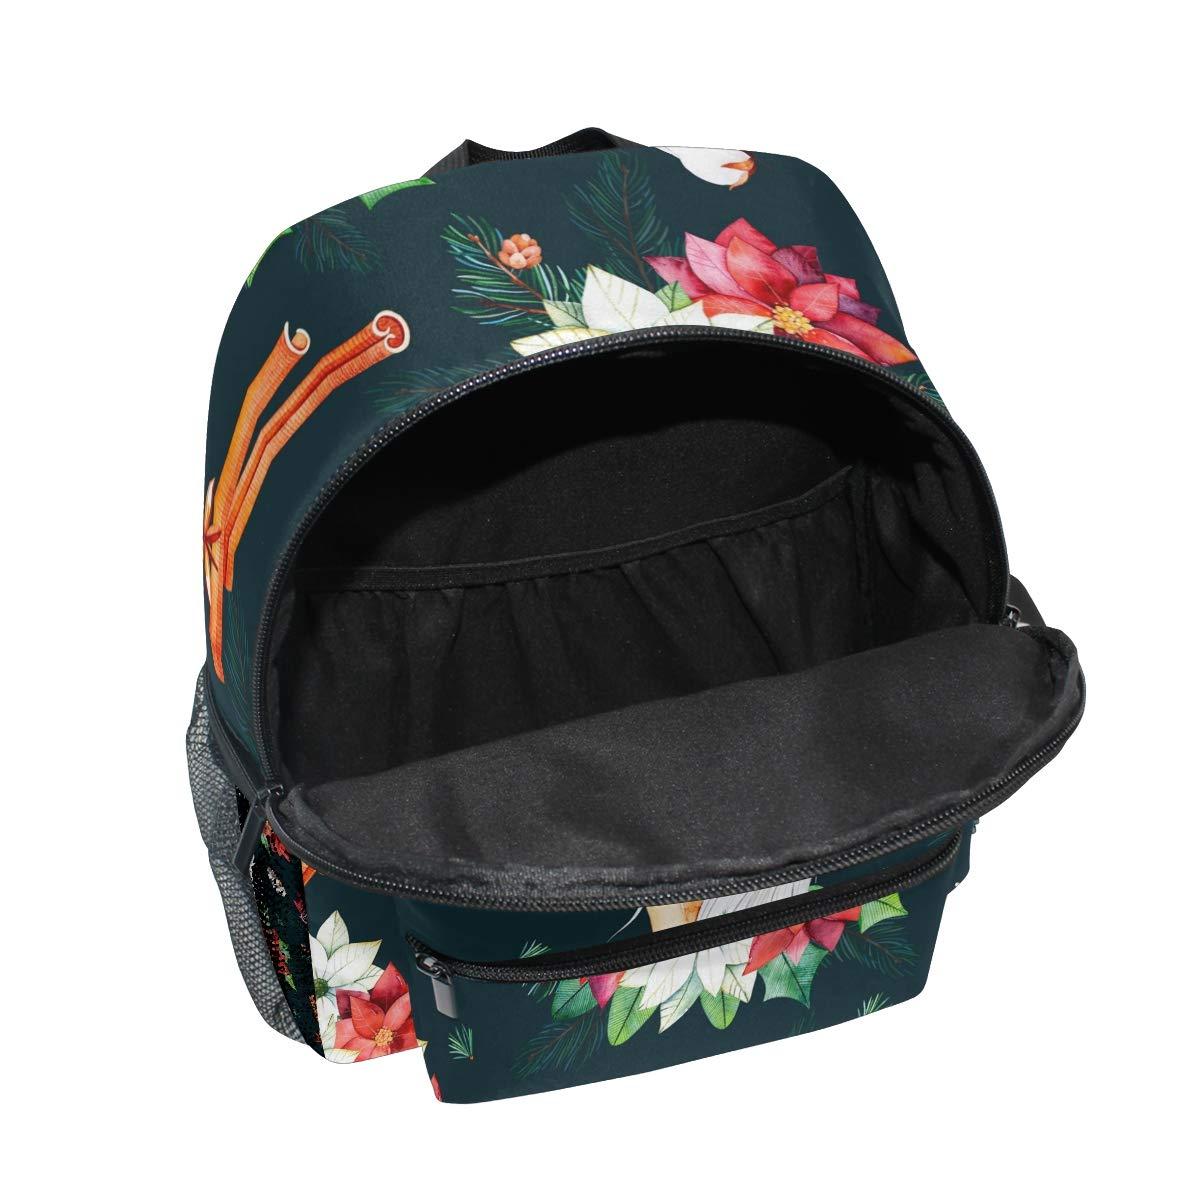 DOSHINE g16085307p204c238s338, Unisex Kinder Kinderrucksack Kinderrucksack Kinderrucksack Mehrfarbig Multi 10''x4''x12'' B07MQTF4DQ Kinderruckscke Trendy c55c51